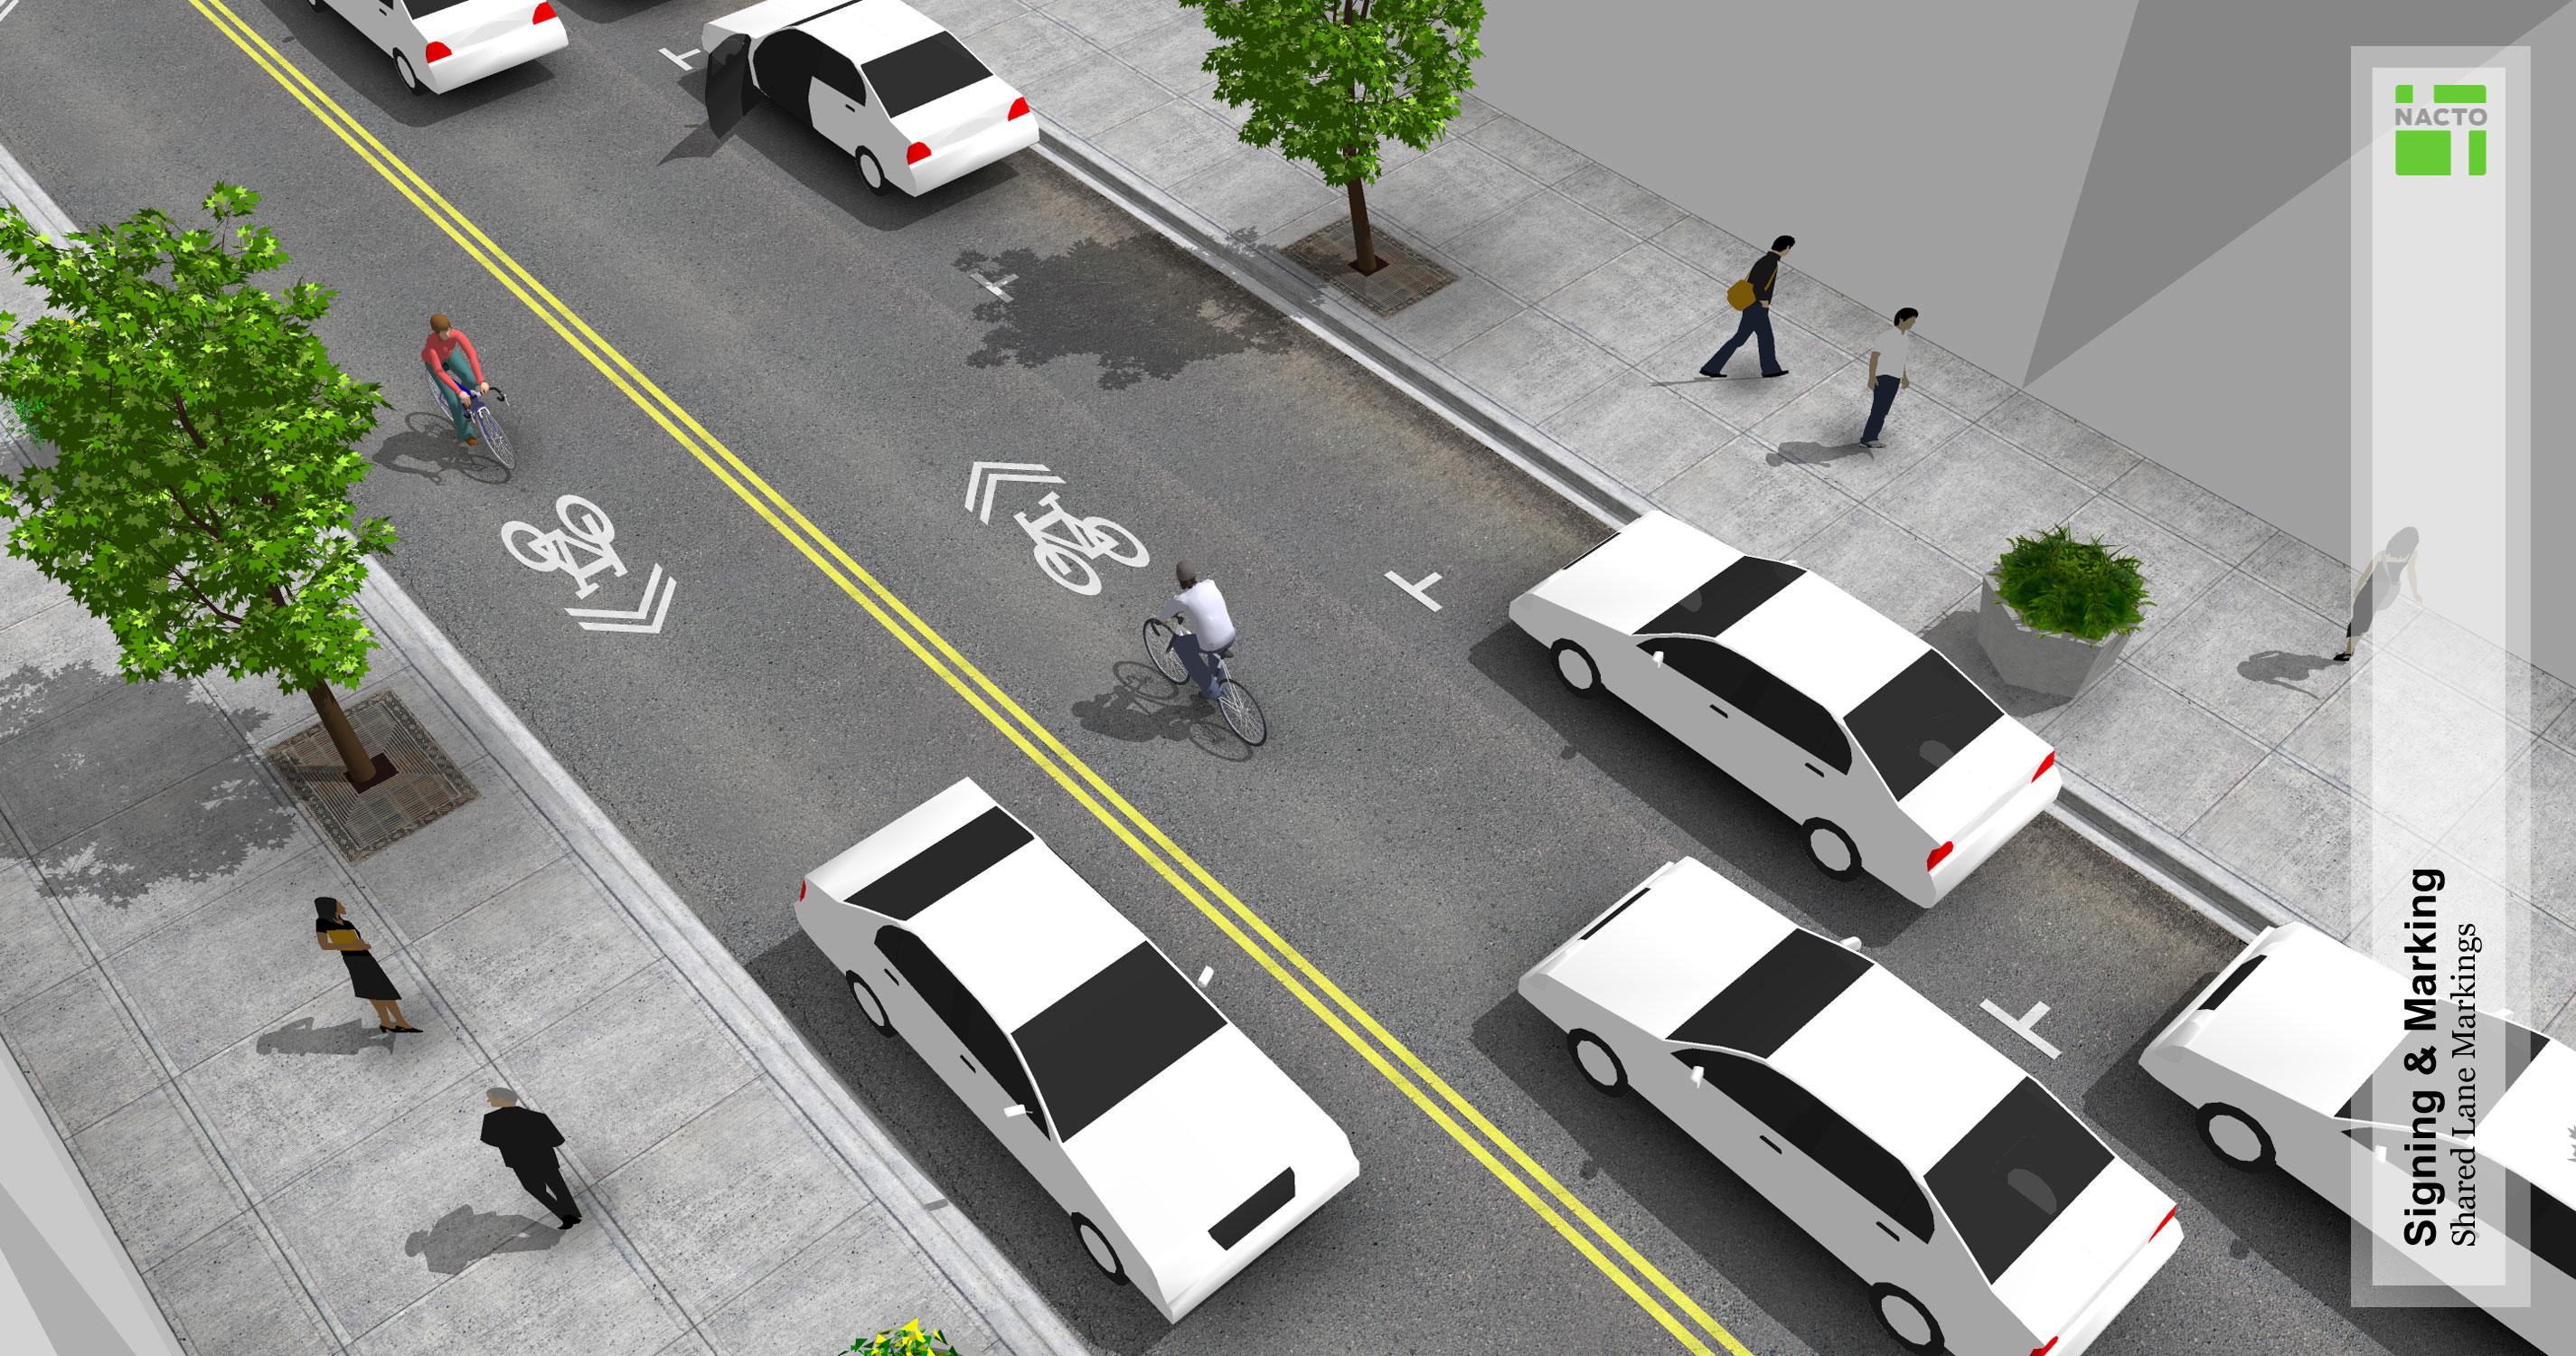 Shared Lane Markings National Association Of City Transportation Officials